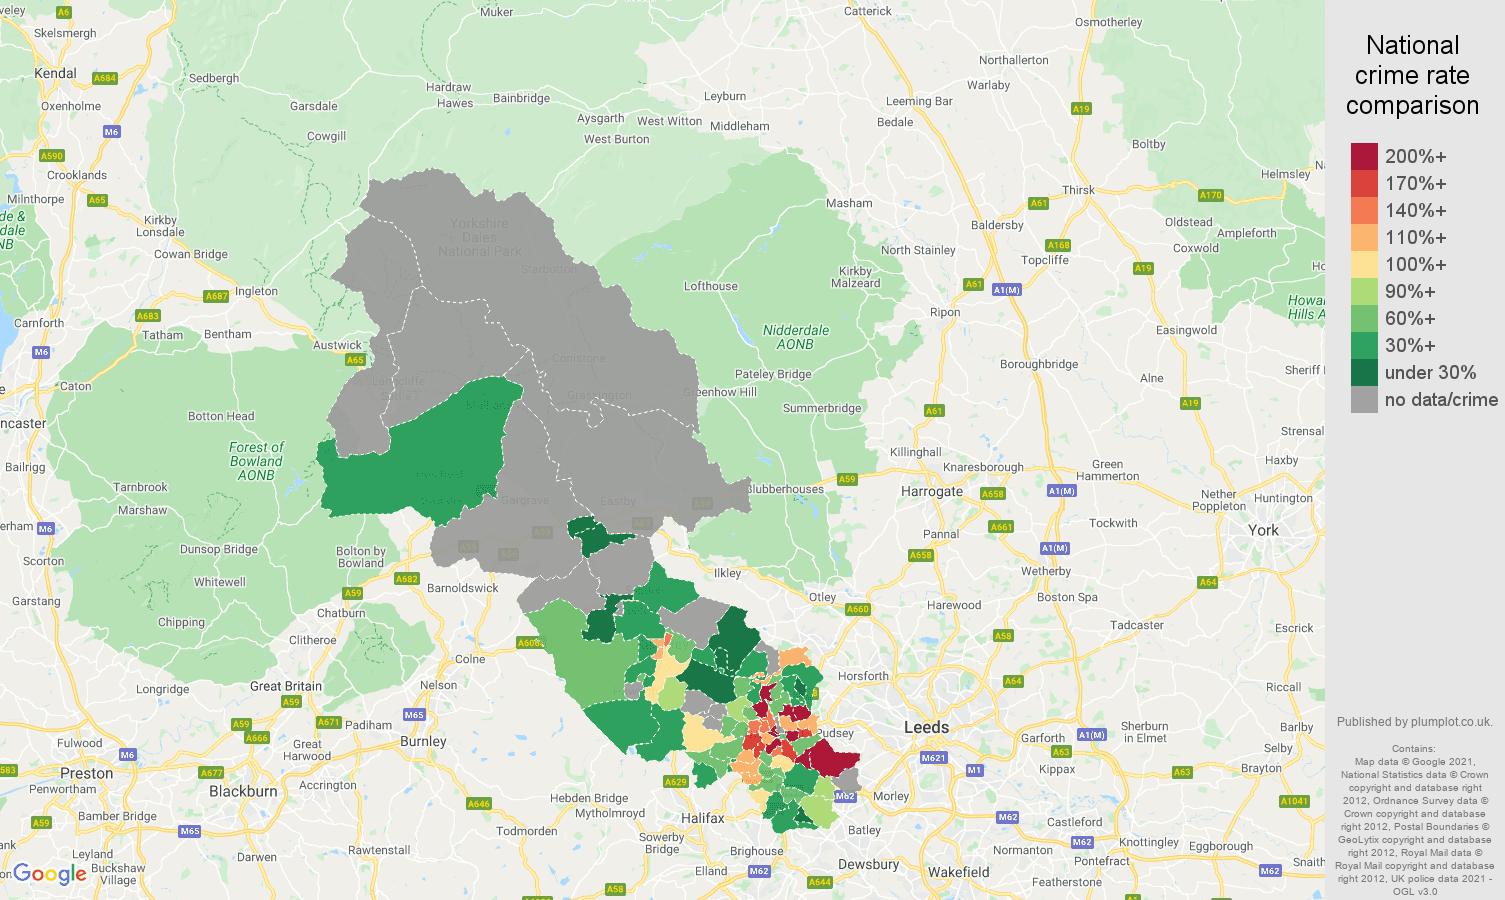 Bradford robbery crime rate comparison map